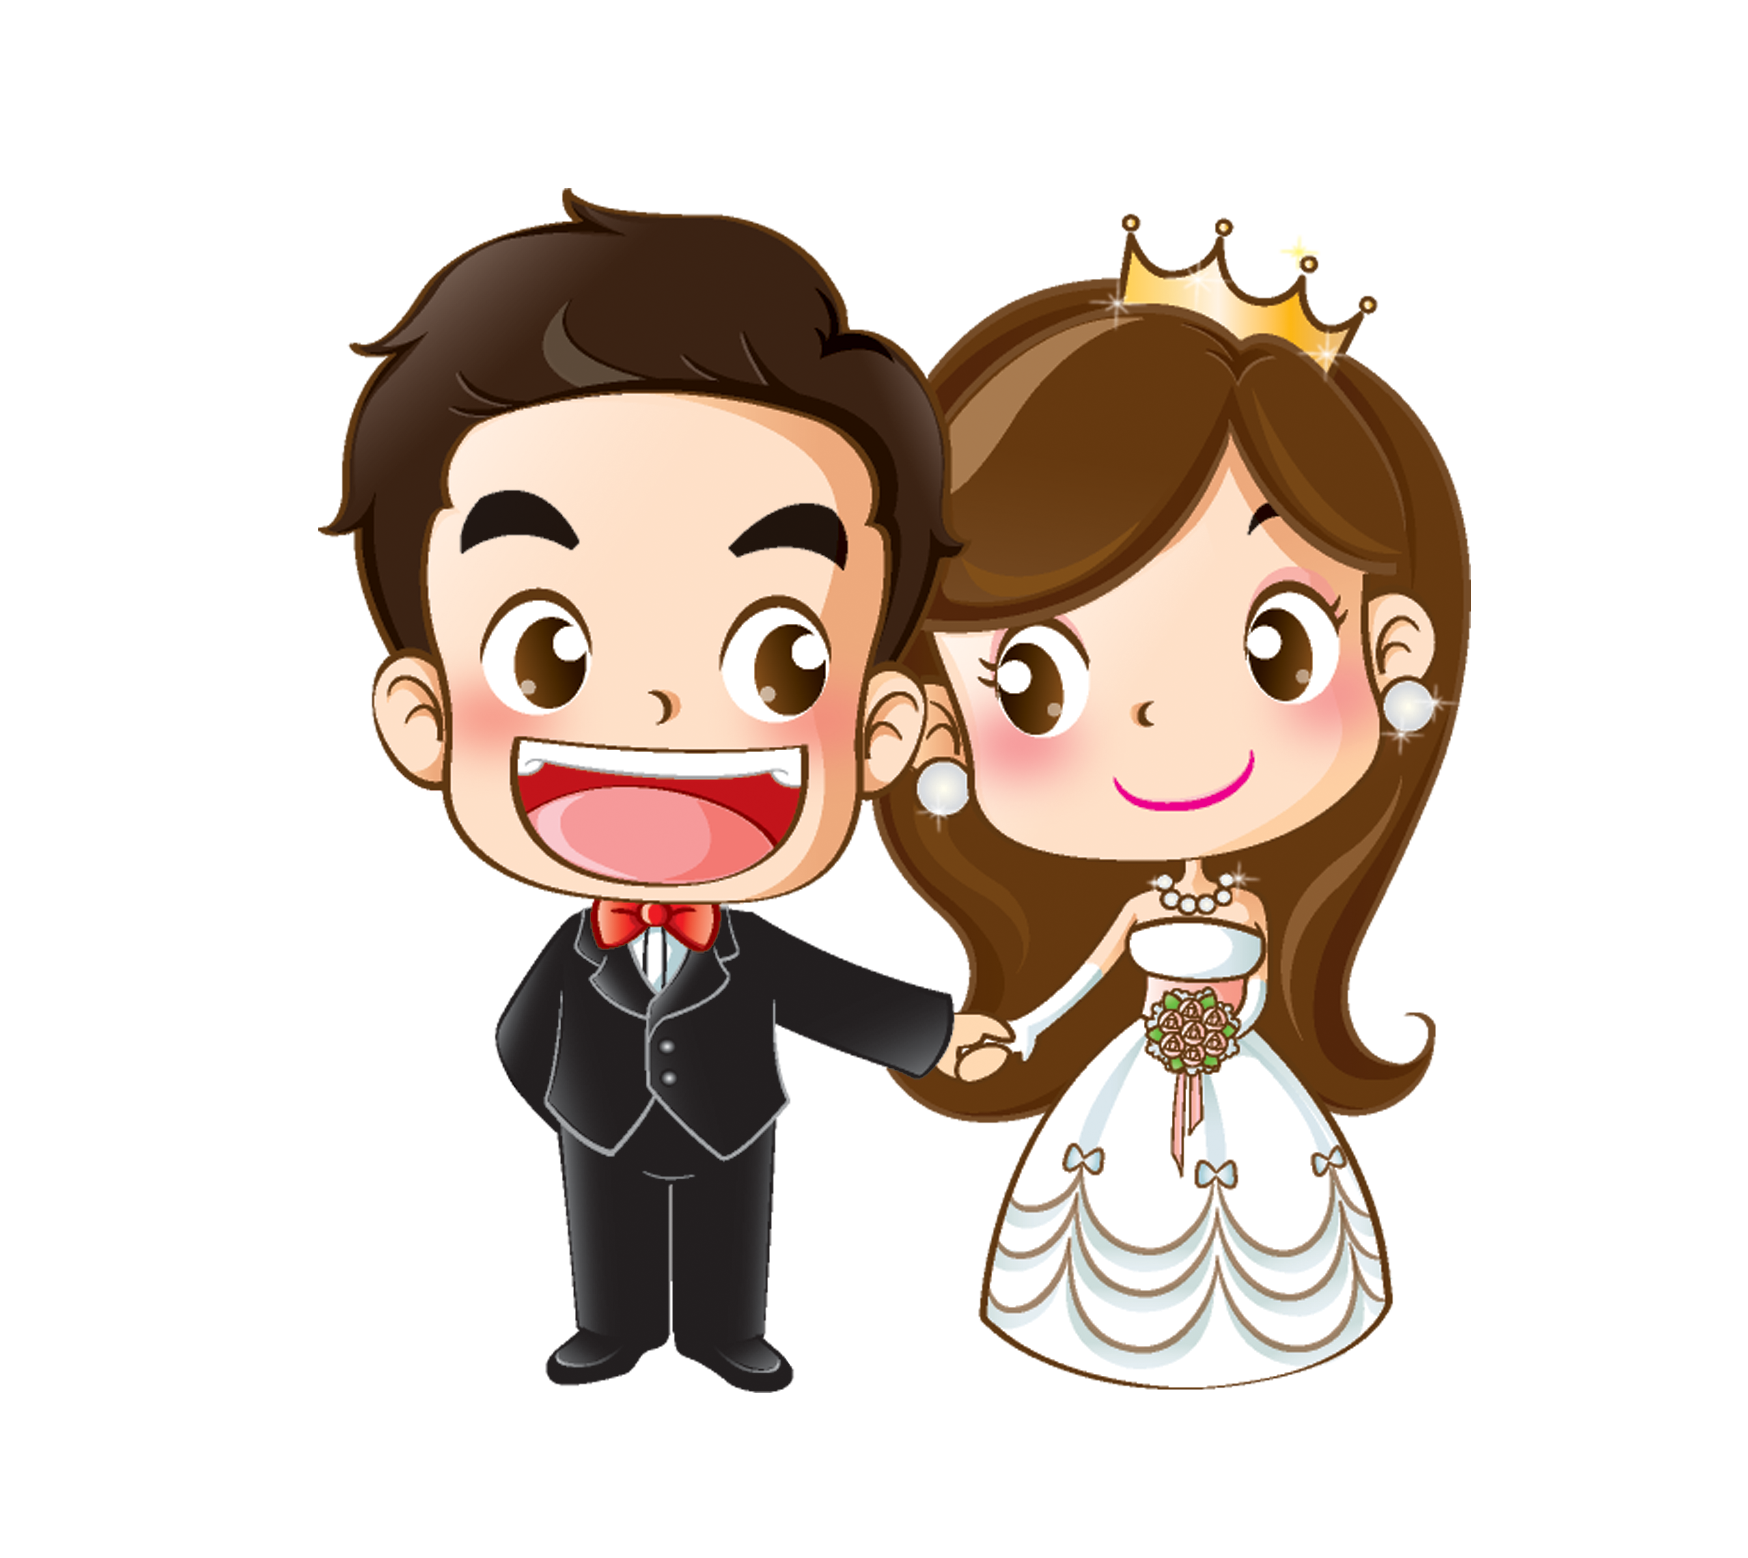 Invitation clipart colour. Wedding cartoon drawing at